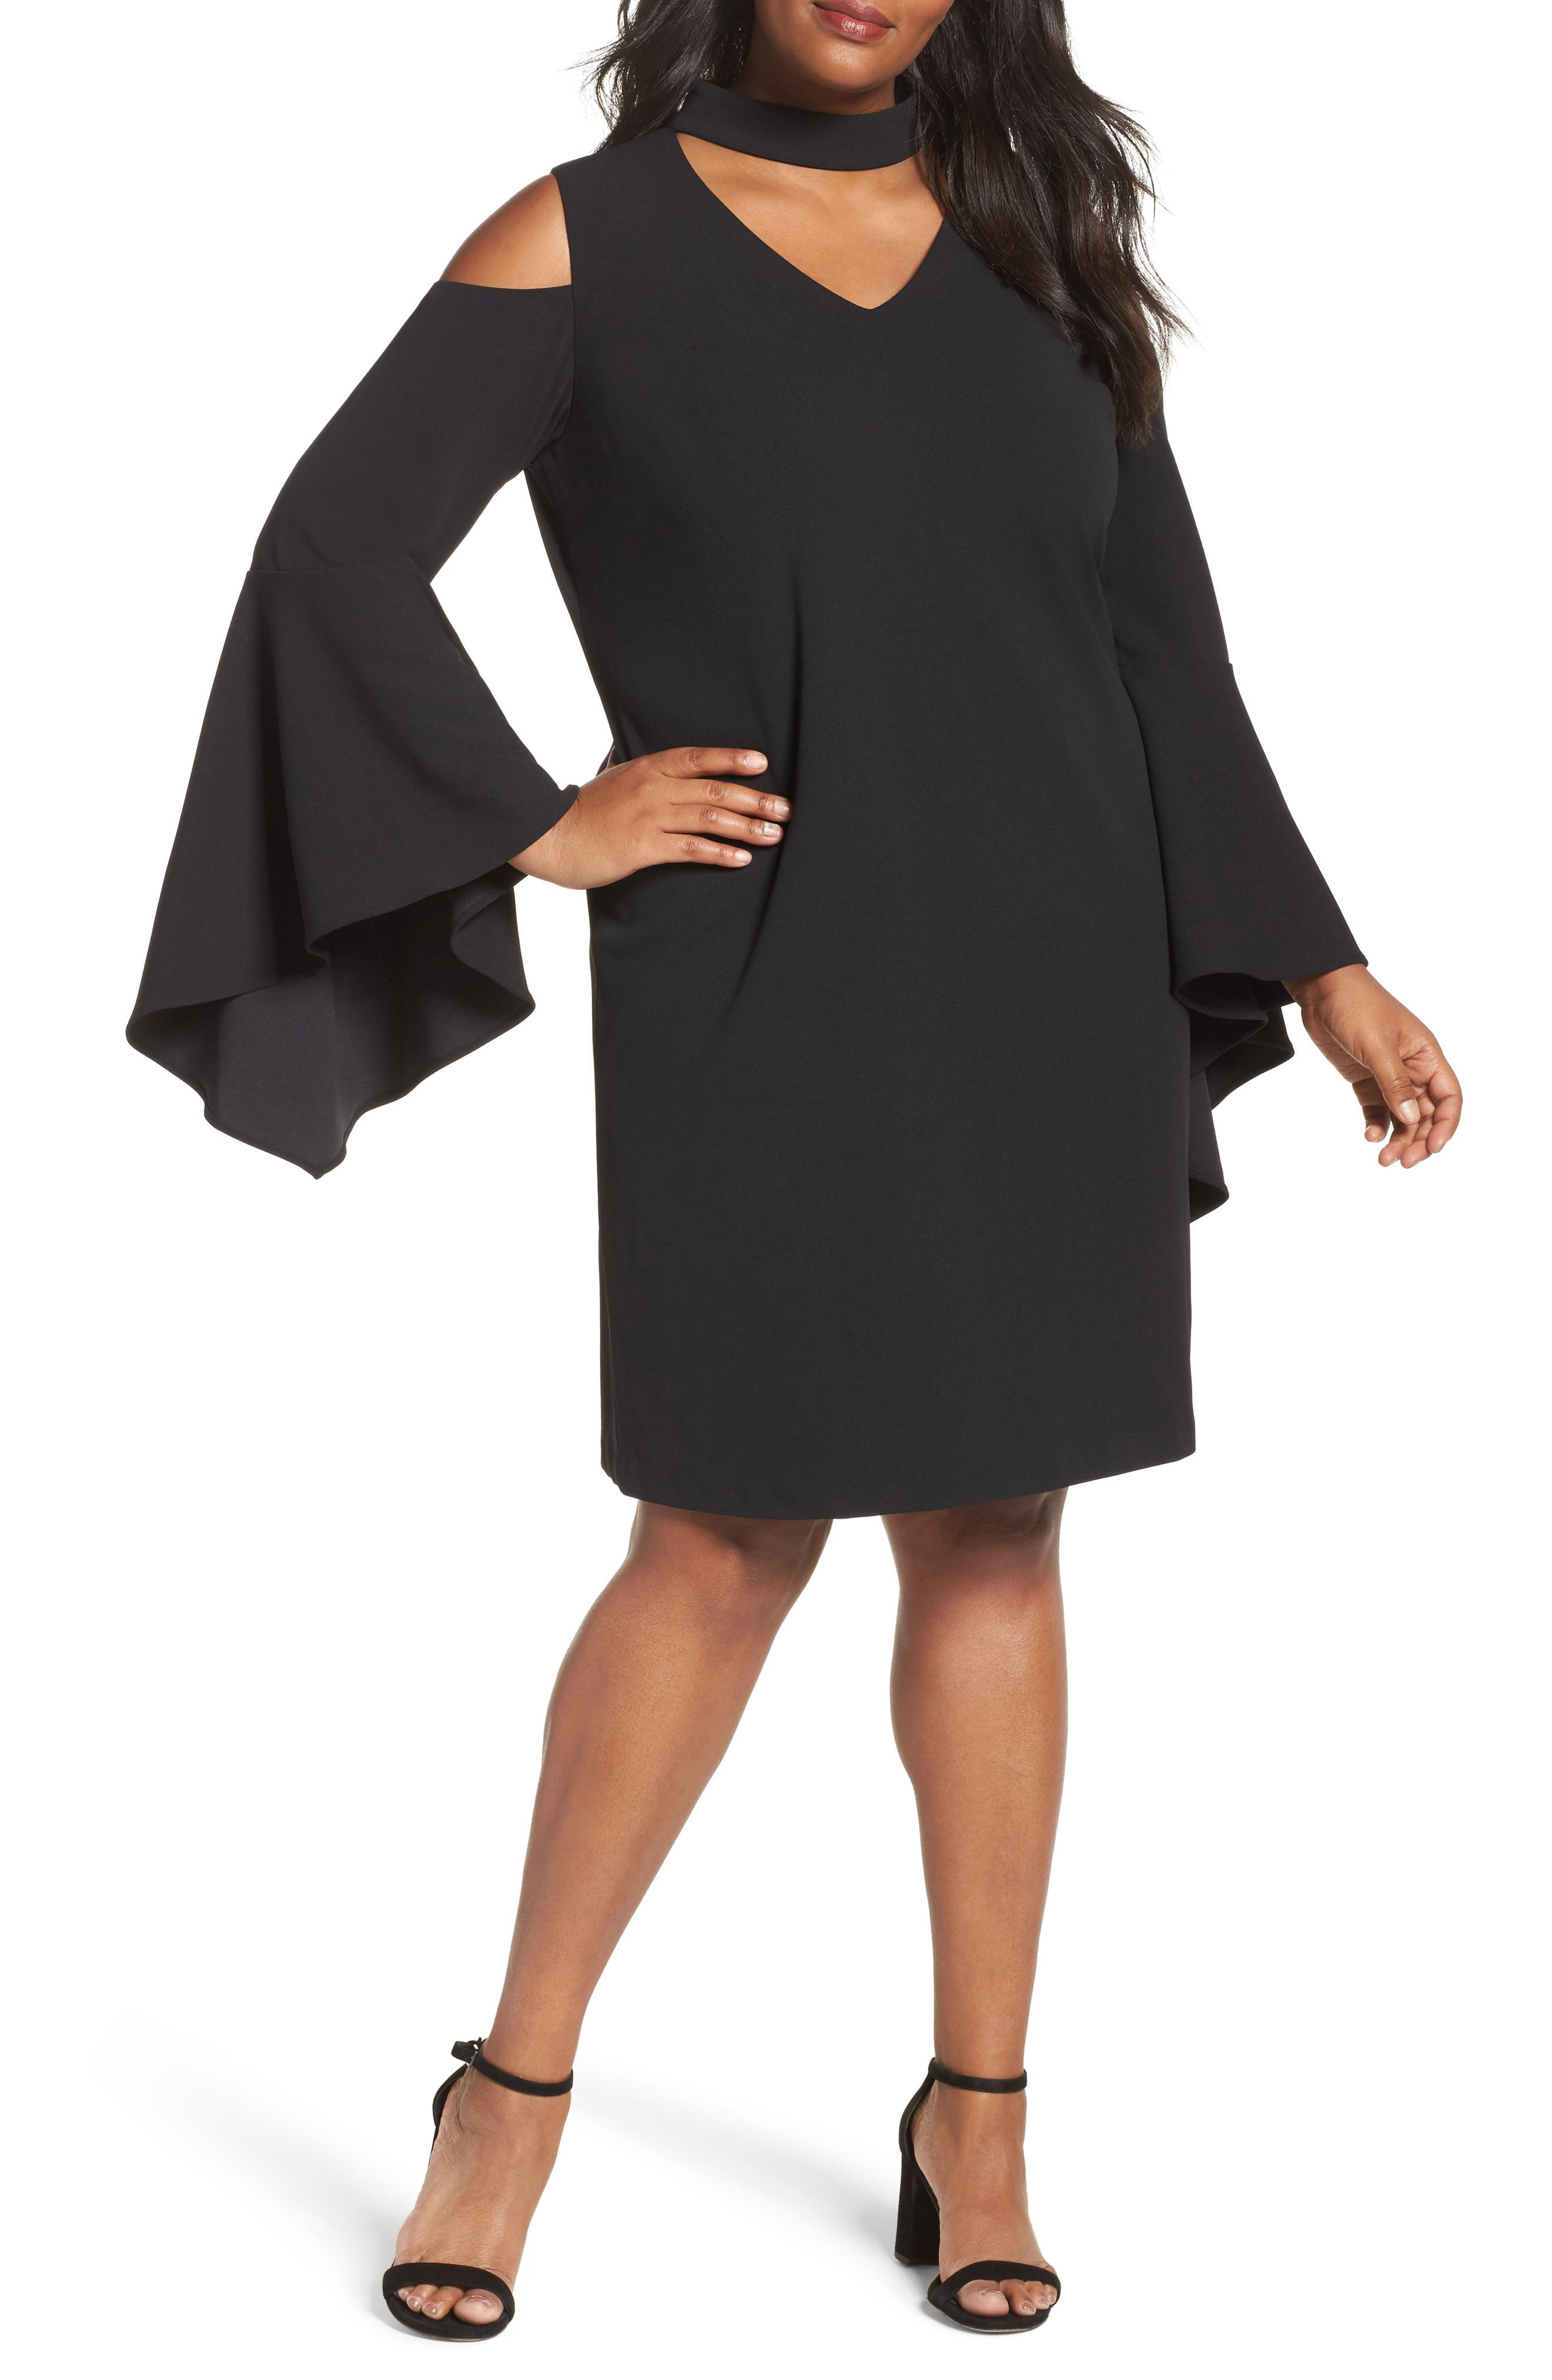 Main Image - Vince Camuto Cold Shoulder Bell Sleeve Dress (Plus Size)